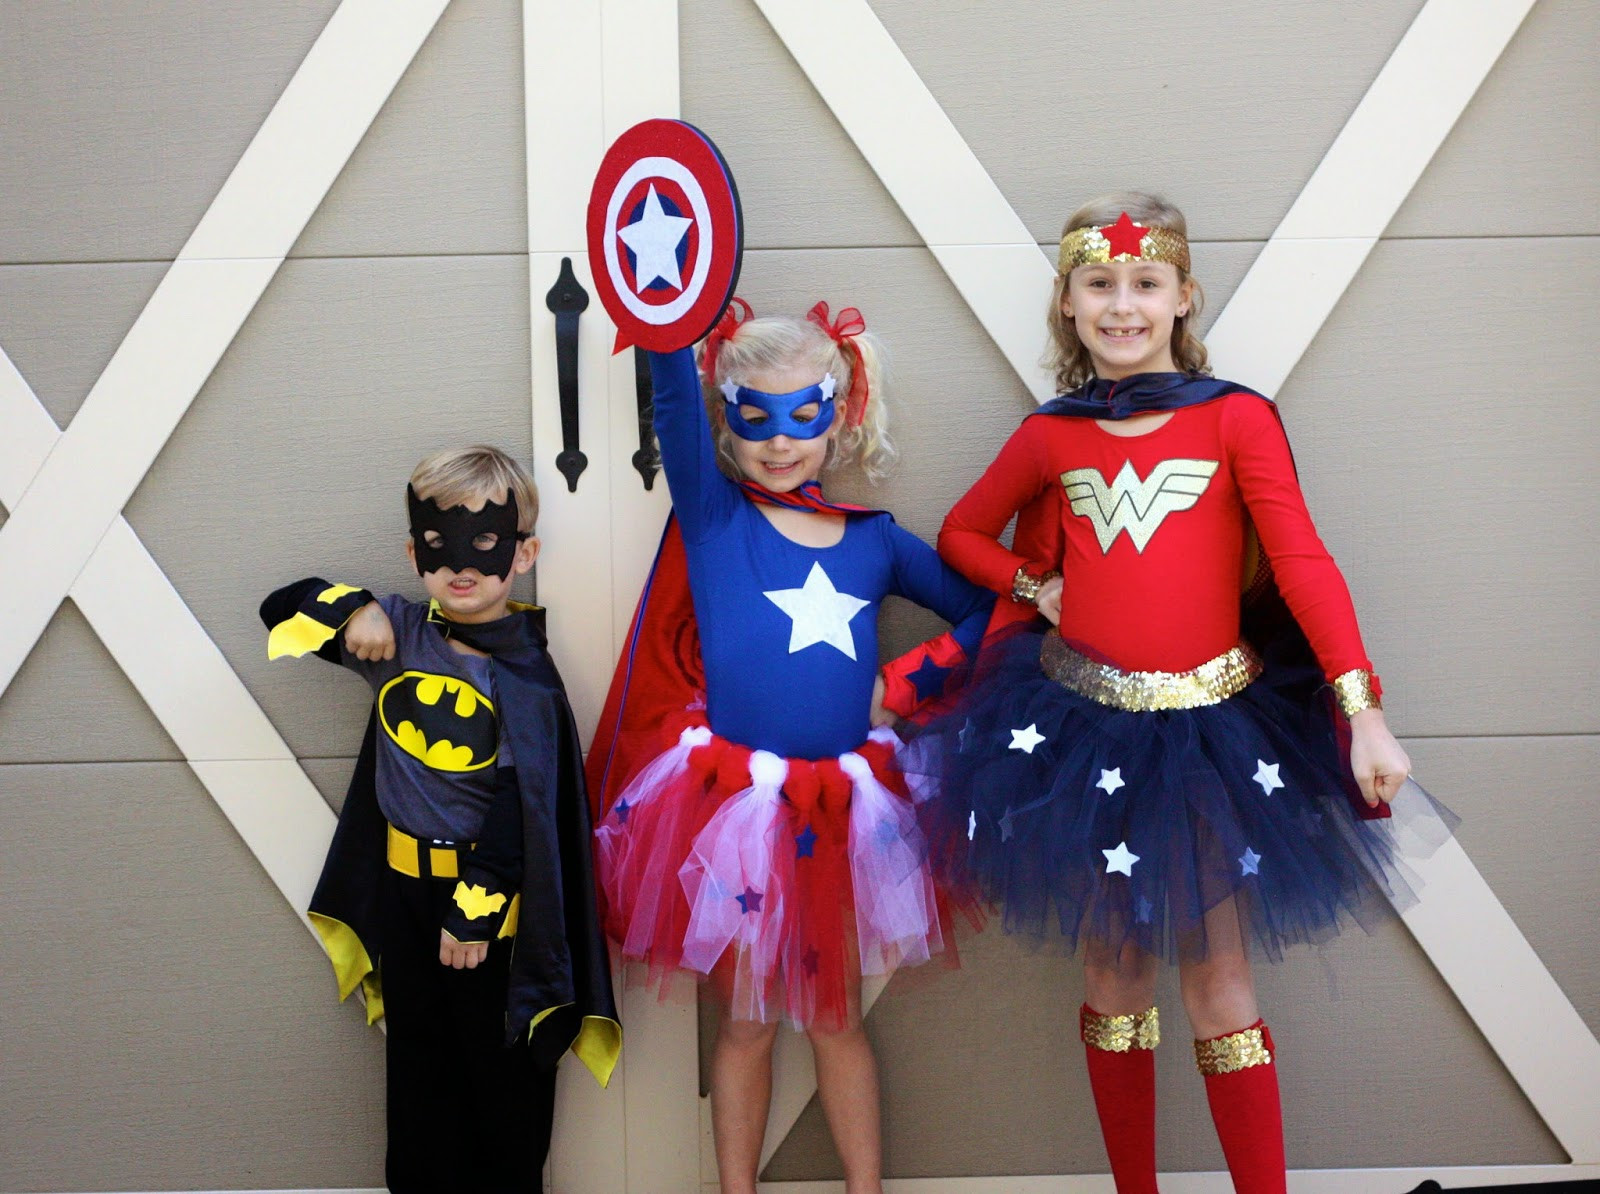 Best ideas about Superhero DIY Costume . Save or Pin Magnolia Mamas DIY Superhero Costumes Now.